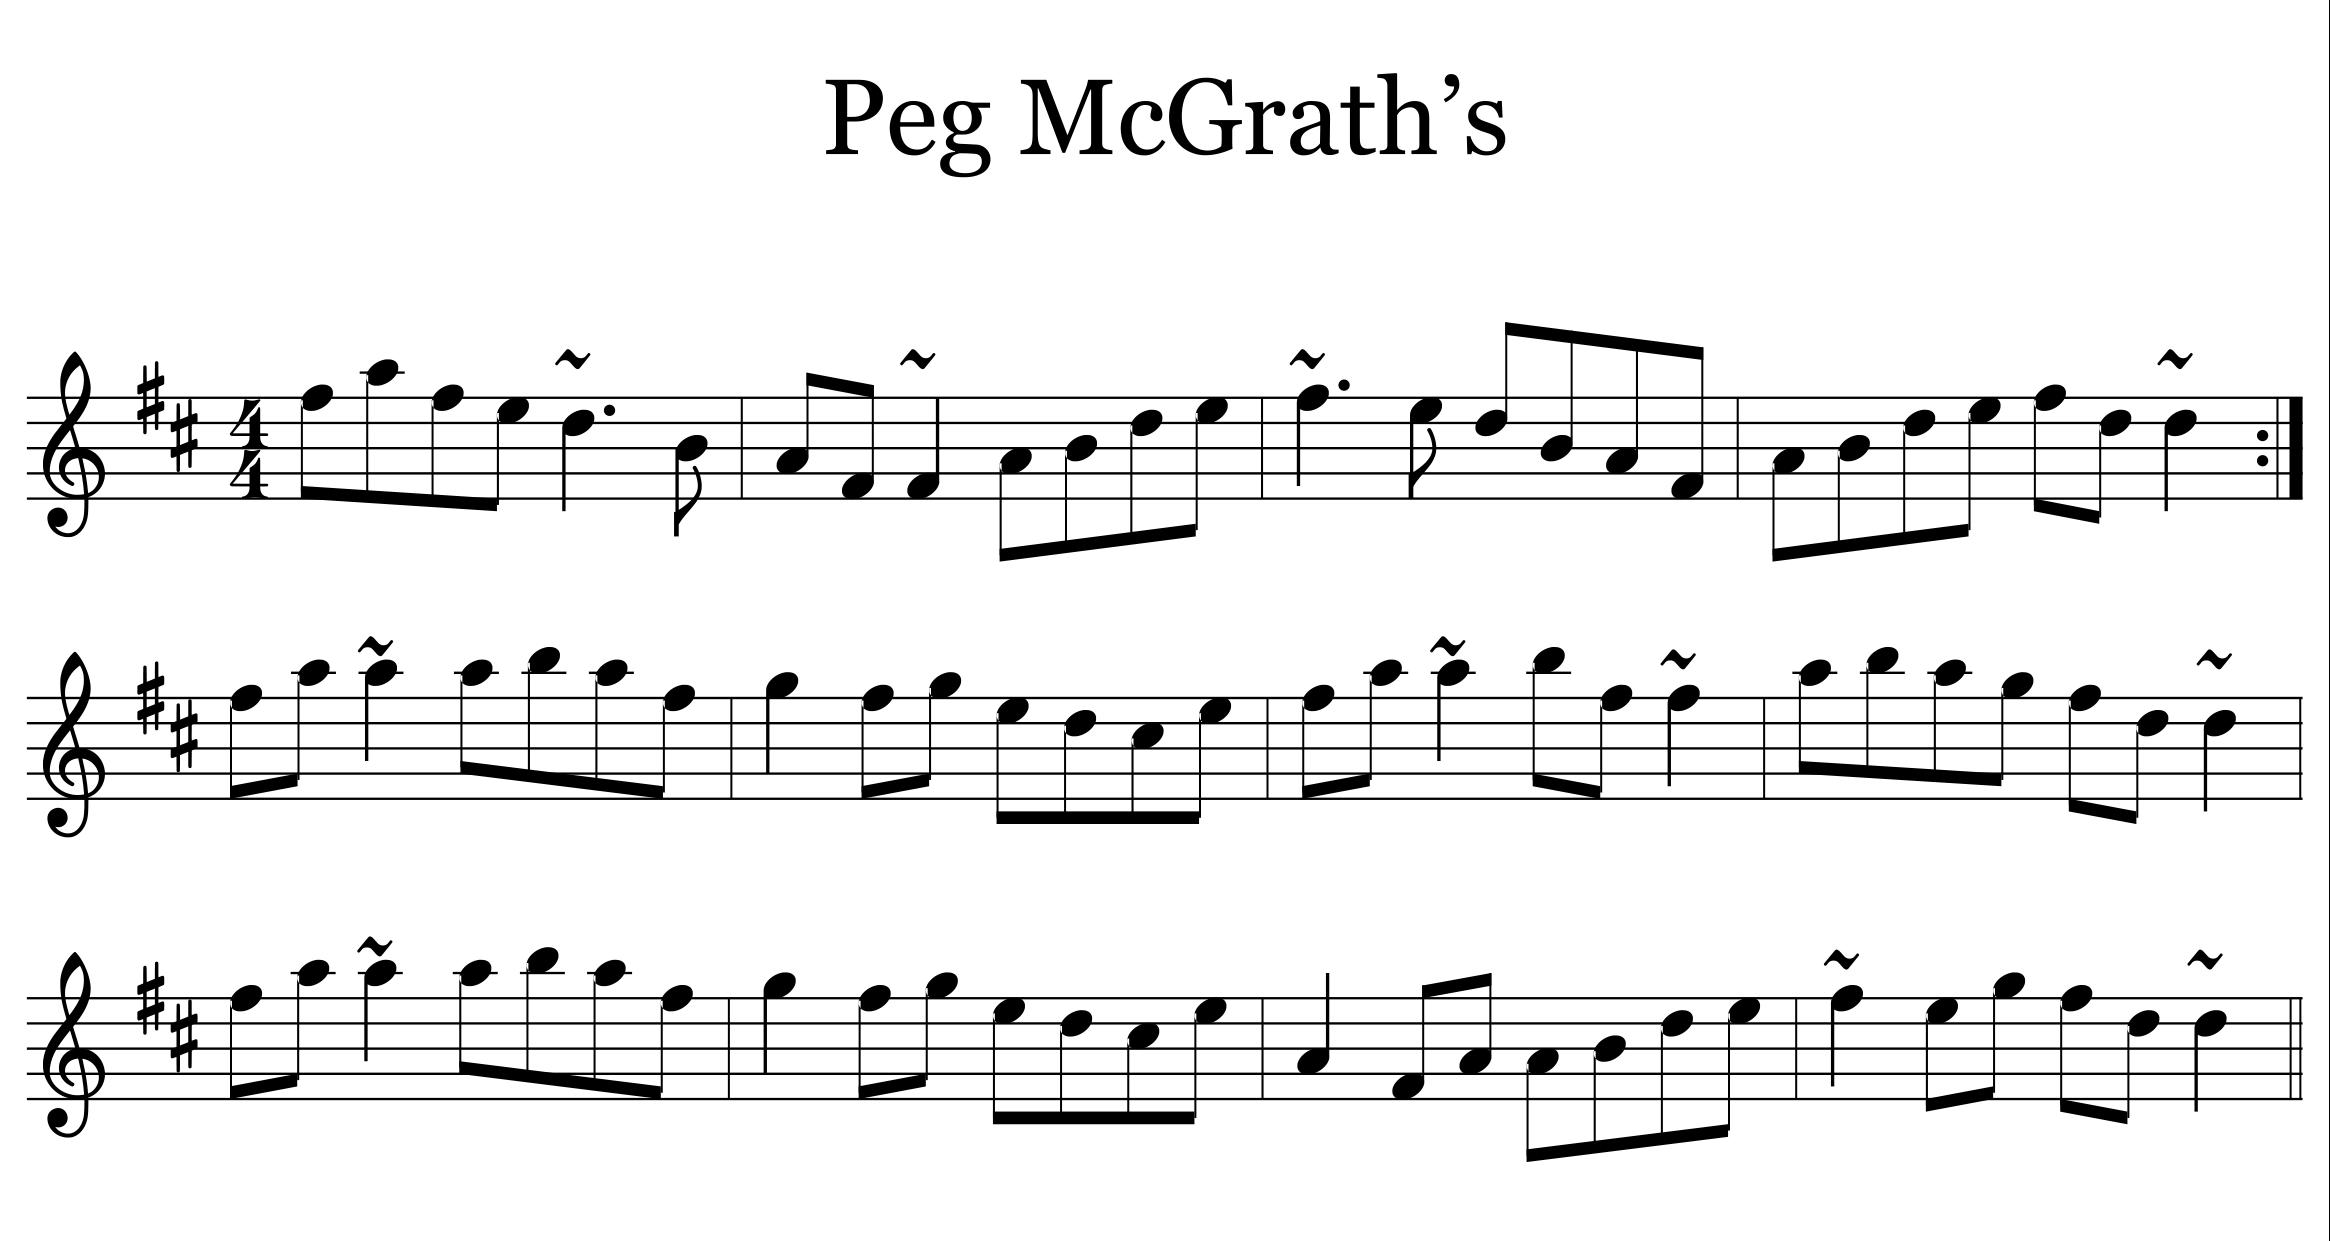 Peg McGrath's Reel